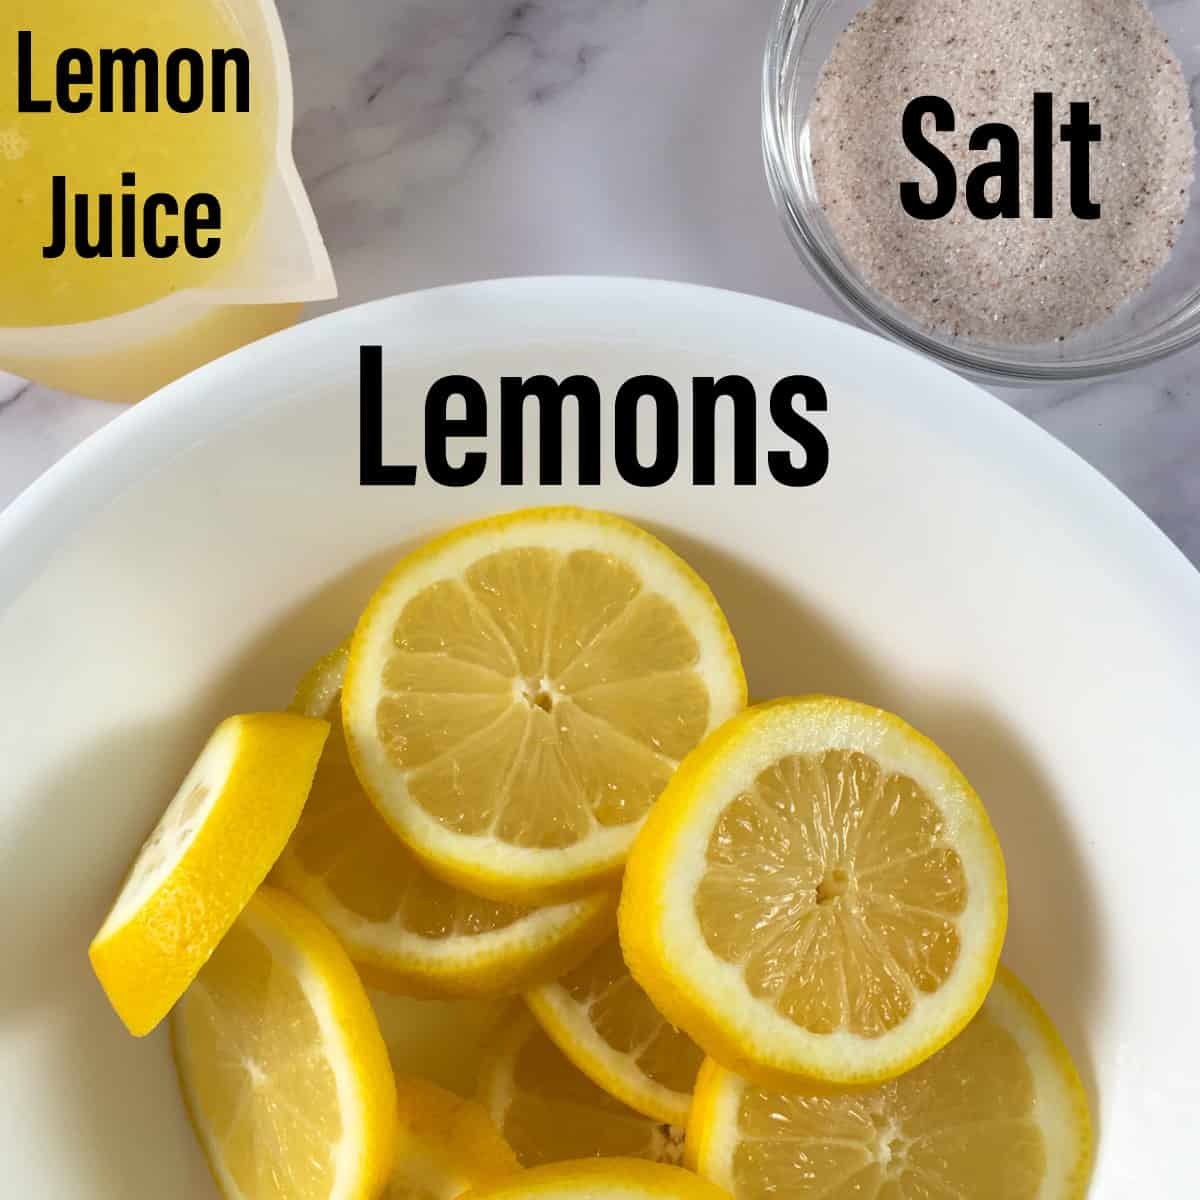 meyer lemons lemon juice salt